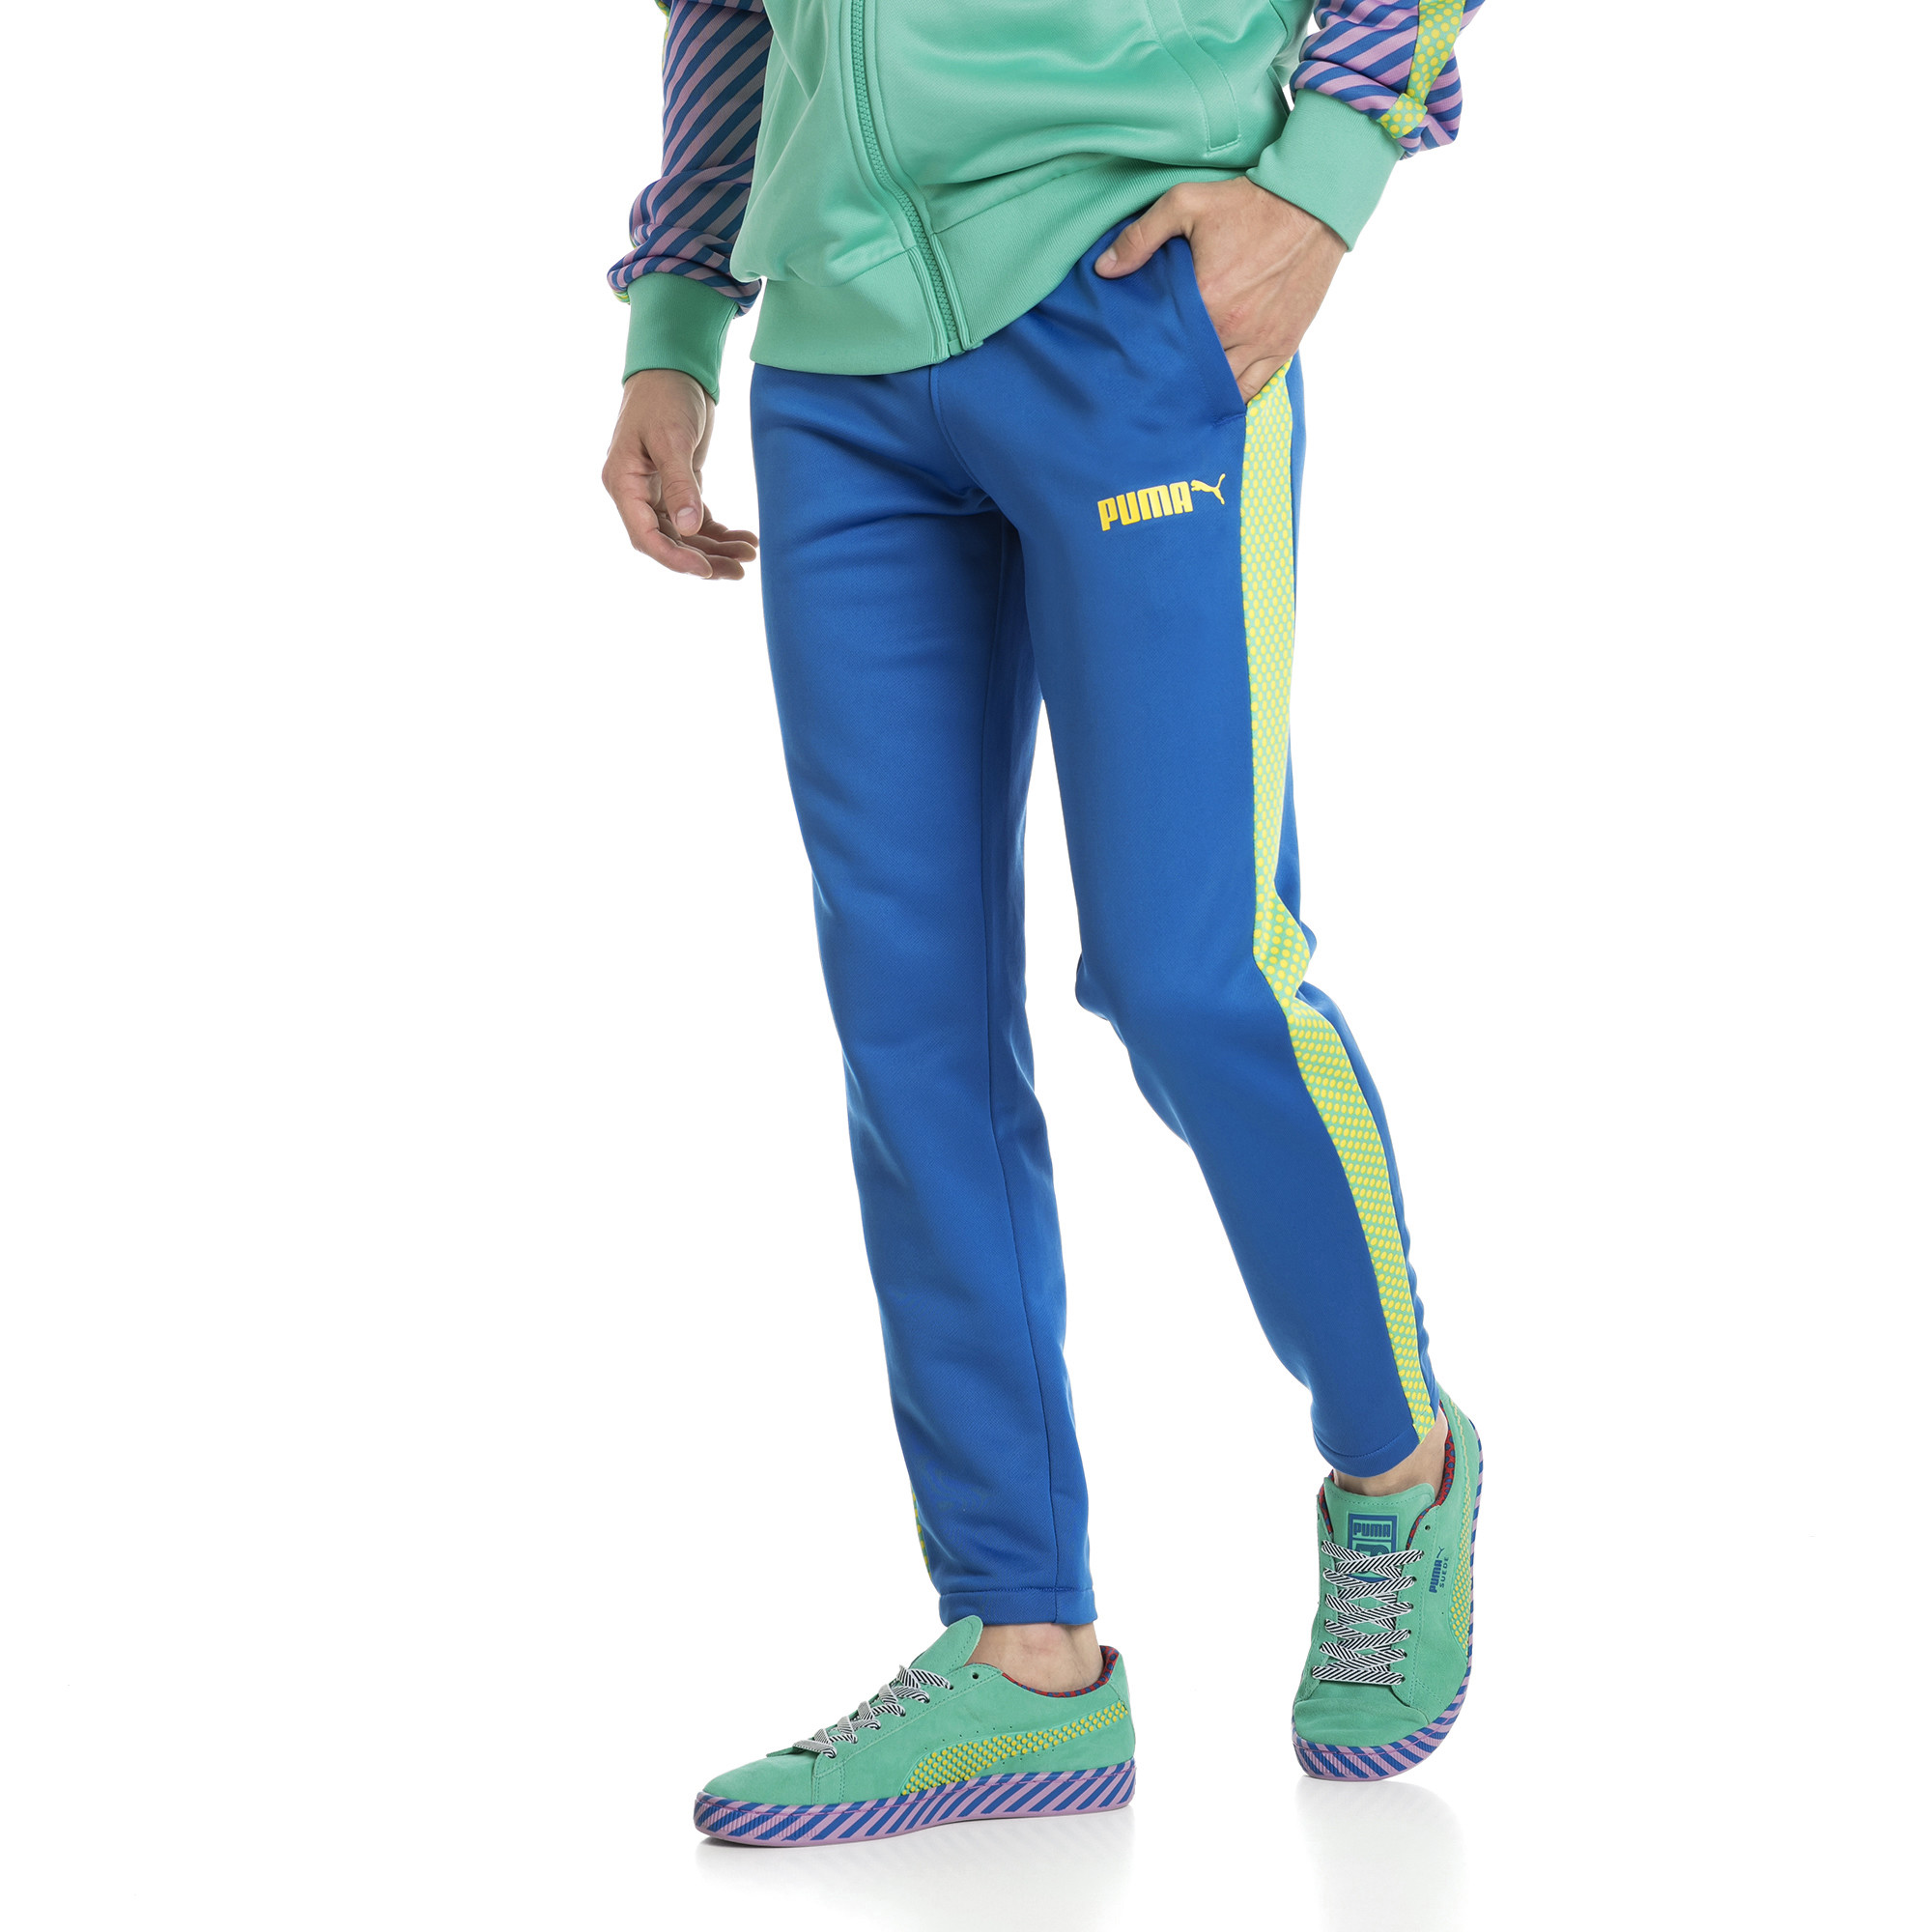 Image Puma T7 Pop Men's Track Pants #1